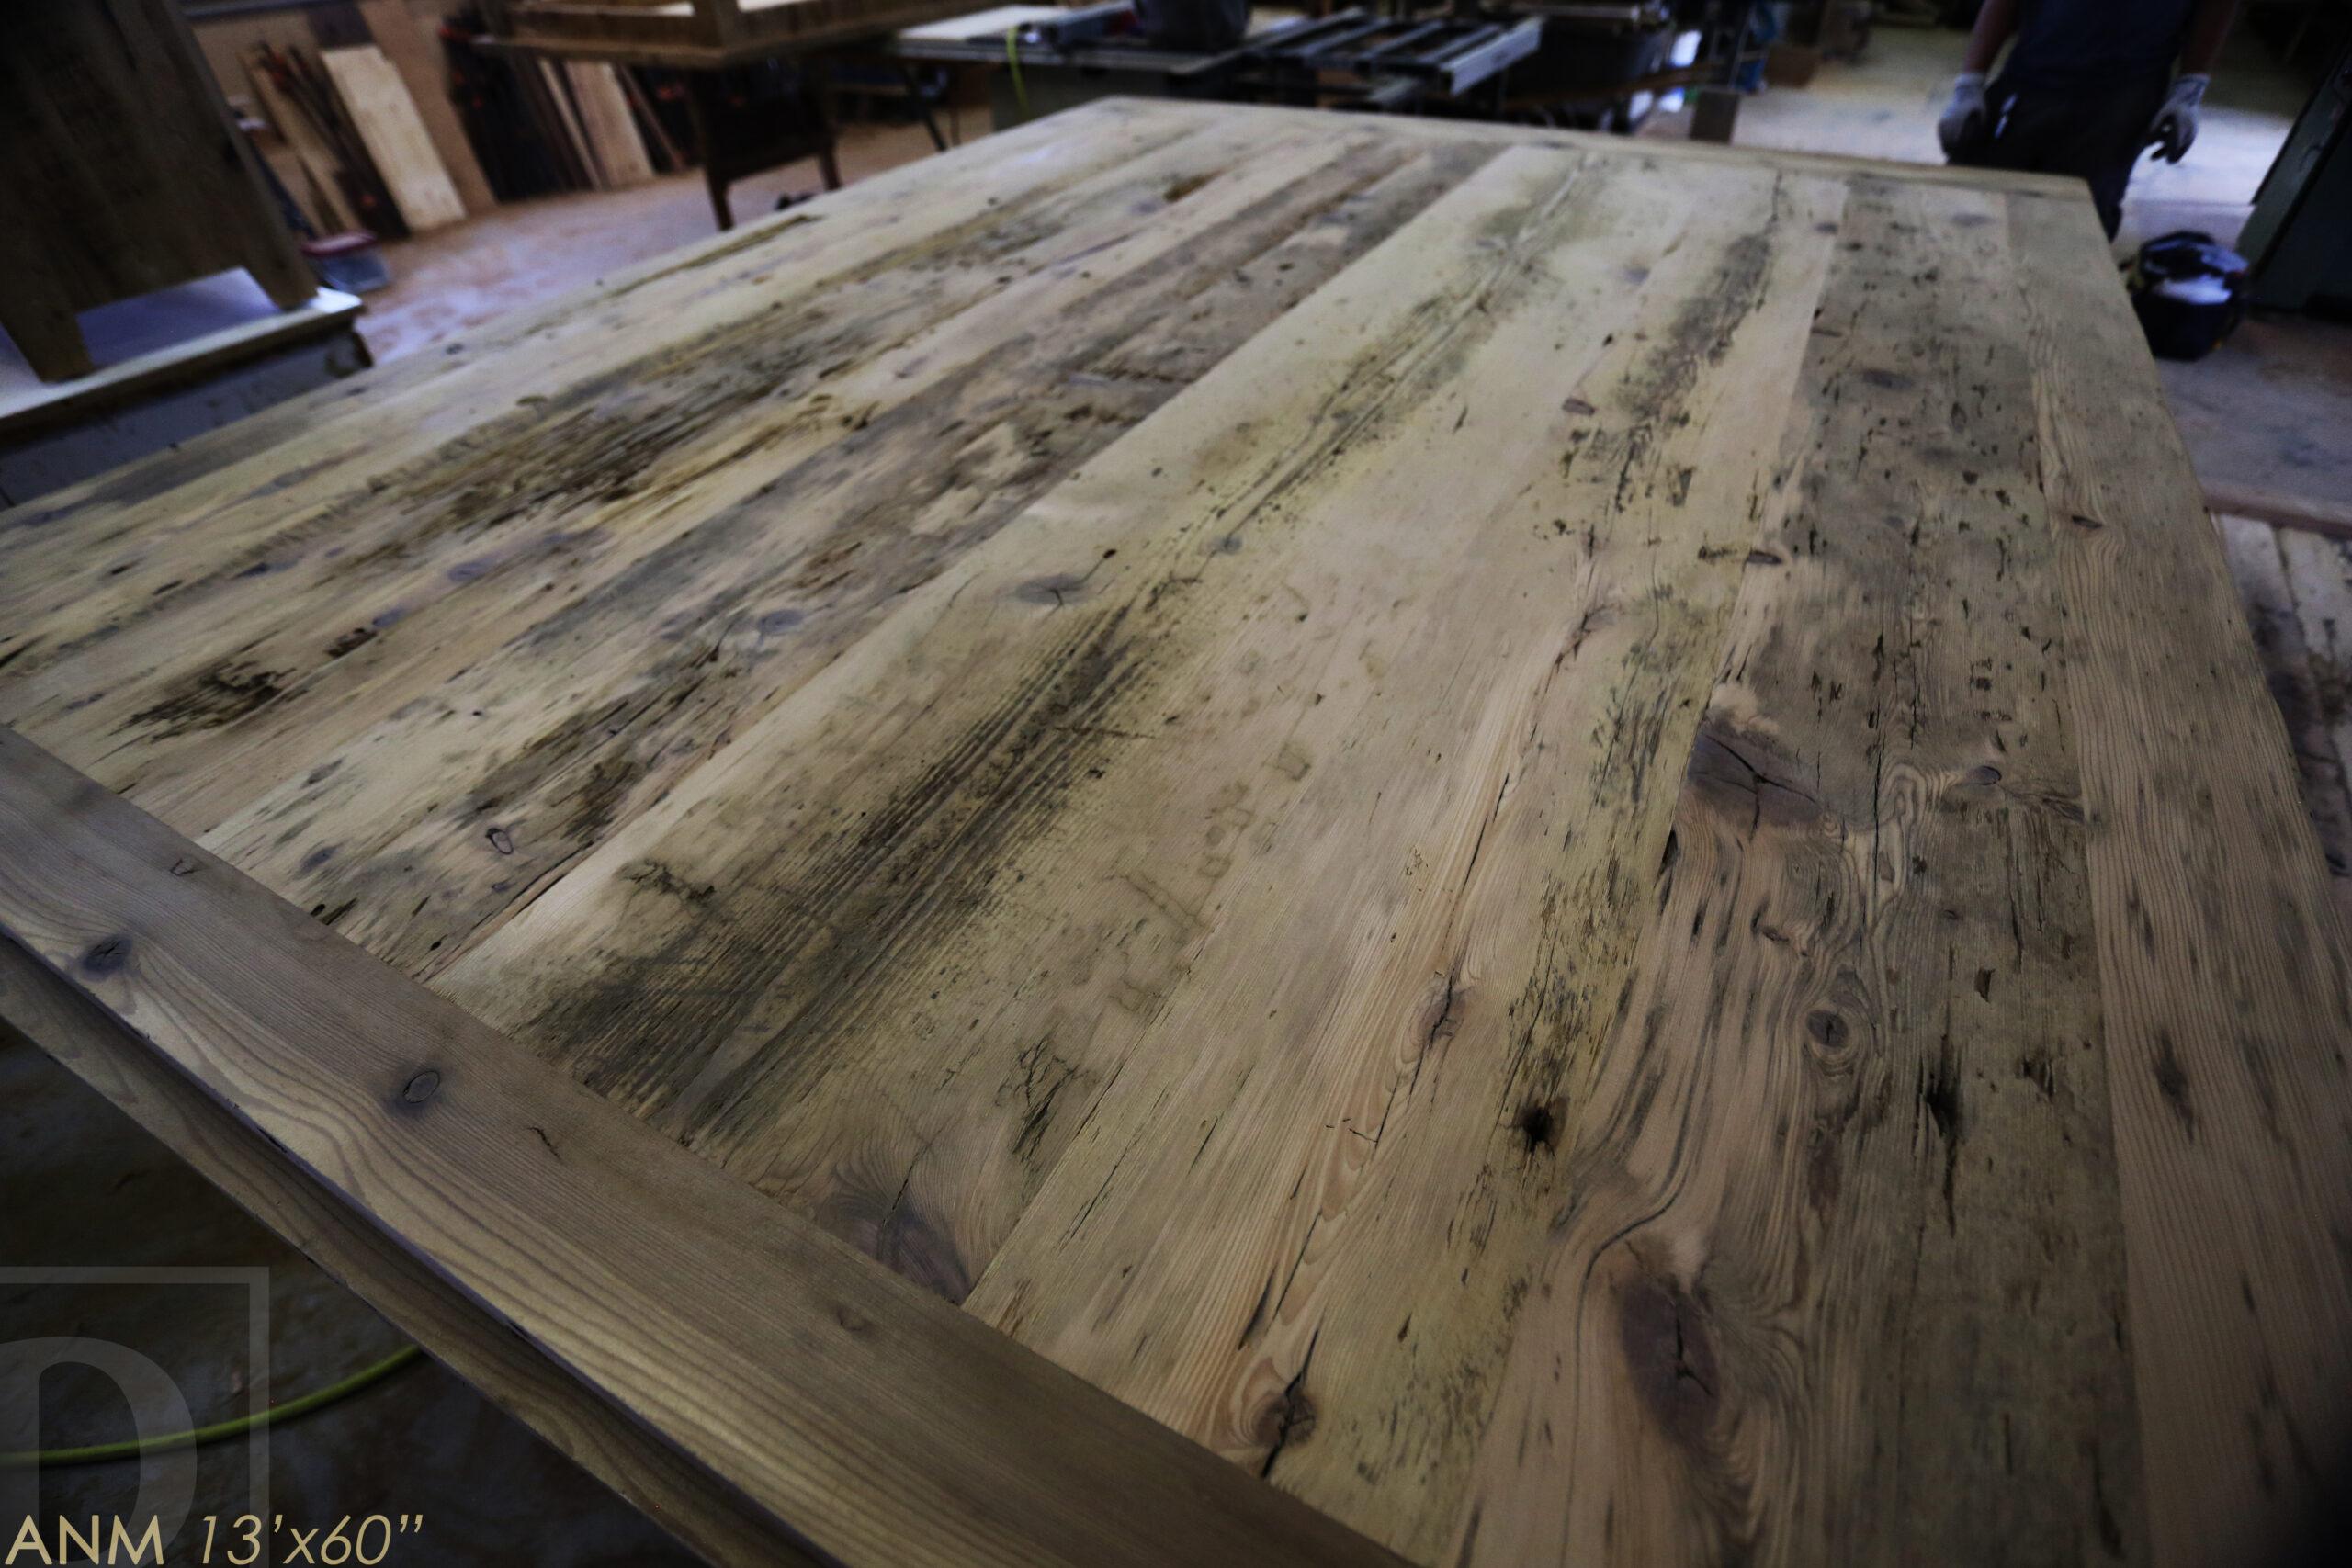 "13' Ontario Barnwood Boardroom Table we made for a Toronto company - 60"" wide - Matte Black U Shaped Metal Base - 2"" Hemlock Threshing Floor Top - Original edges & distressing maintained - Premium epoxy + satin polyurethane finish - www.table.ca"